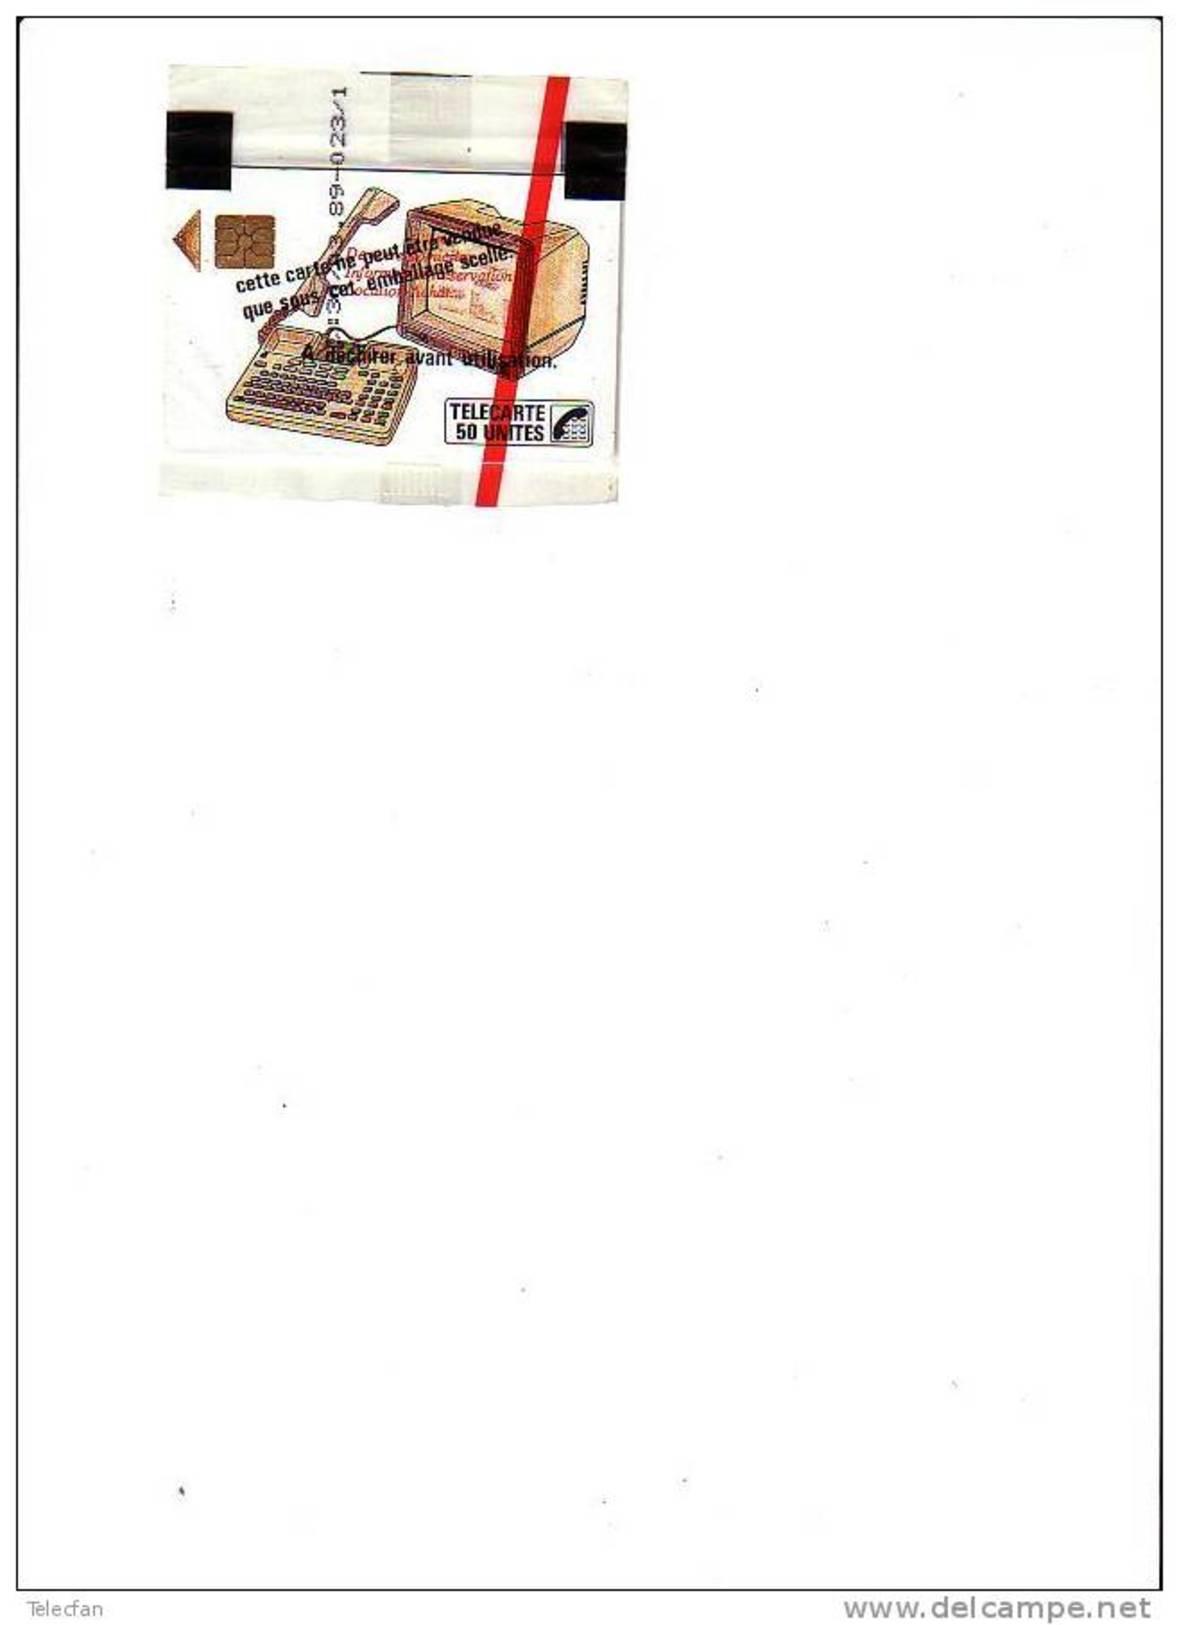 FRANCE BOURGES MINITEL 2000 EX MINT IN BLISTER TRES RARE COTE 700E - 1989